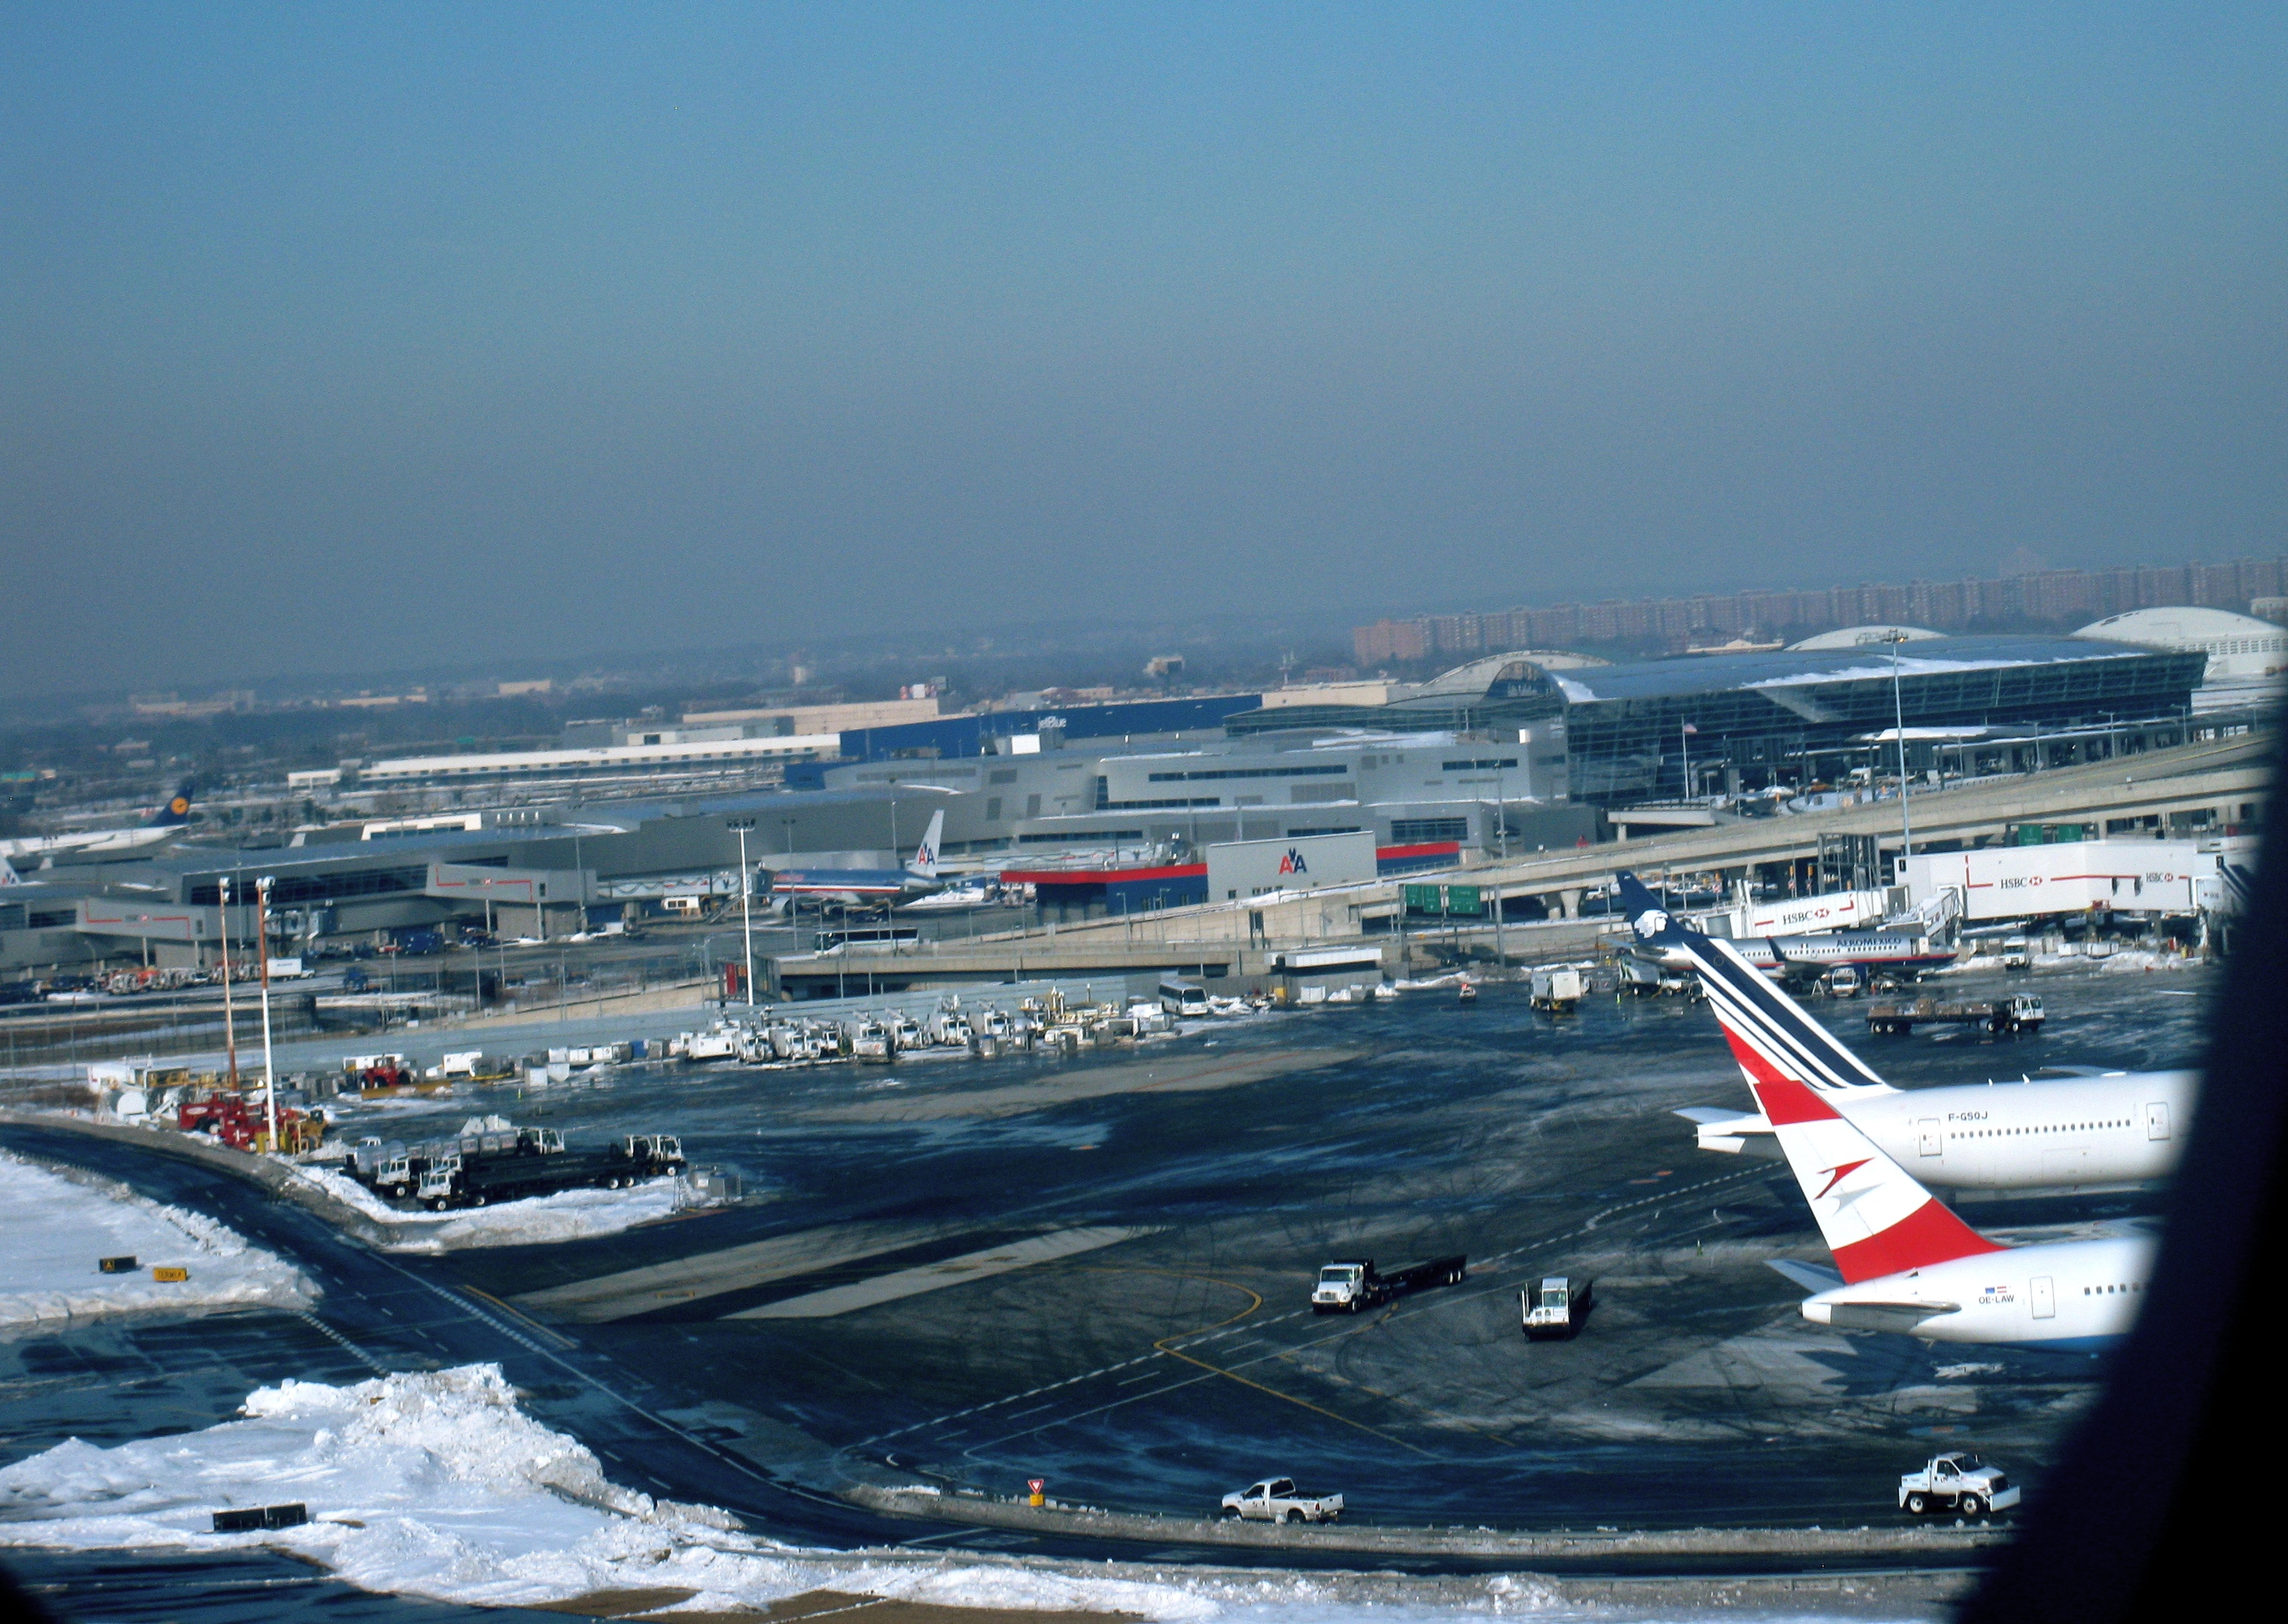 Hotels near john f kennedy international airport jfk html for Hotels near new york airport jfk